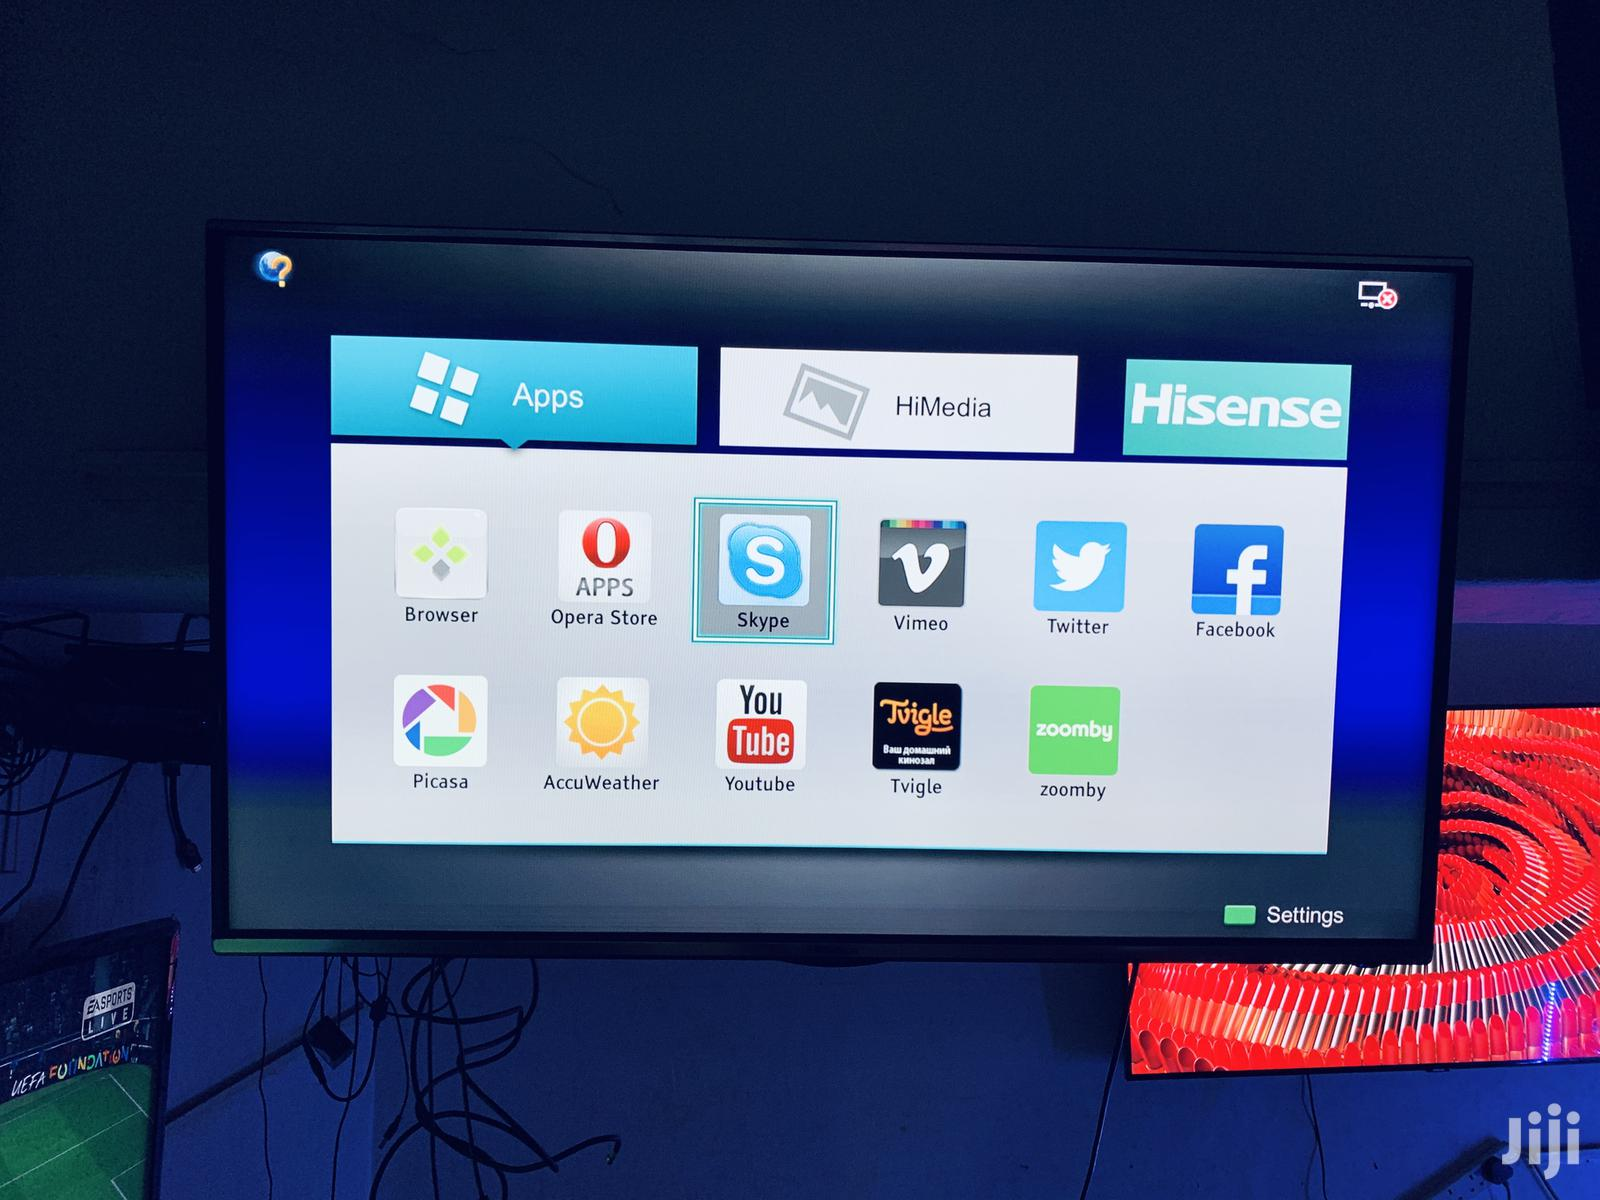 Hisense Smart Smart 3D TV 43 Inches | TV & DVD Equipment for sale in Kampala, Central Region, Uganda